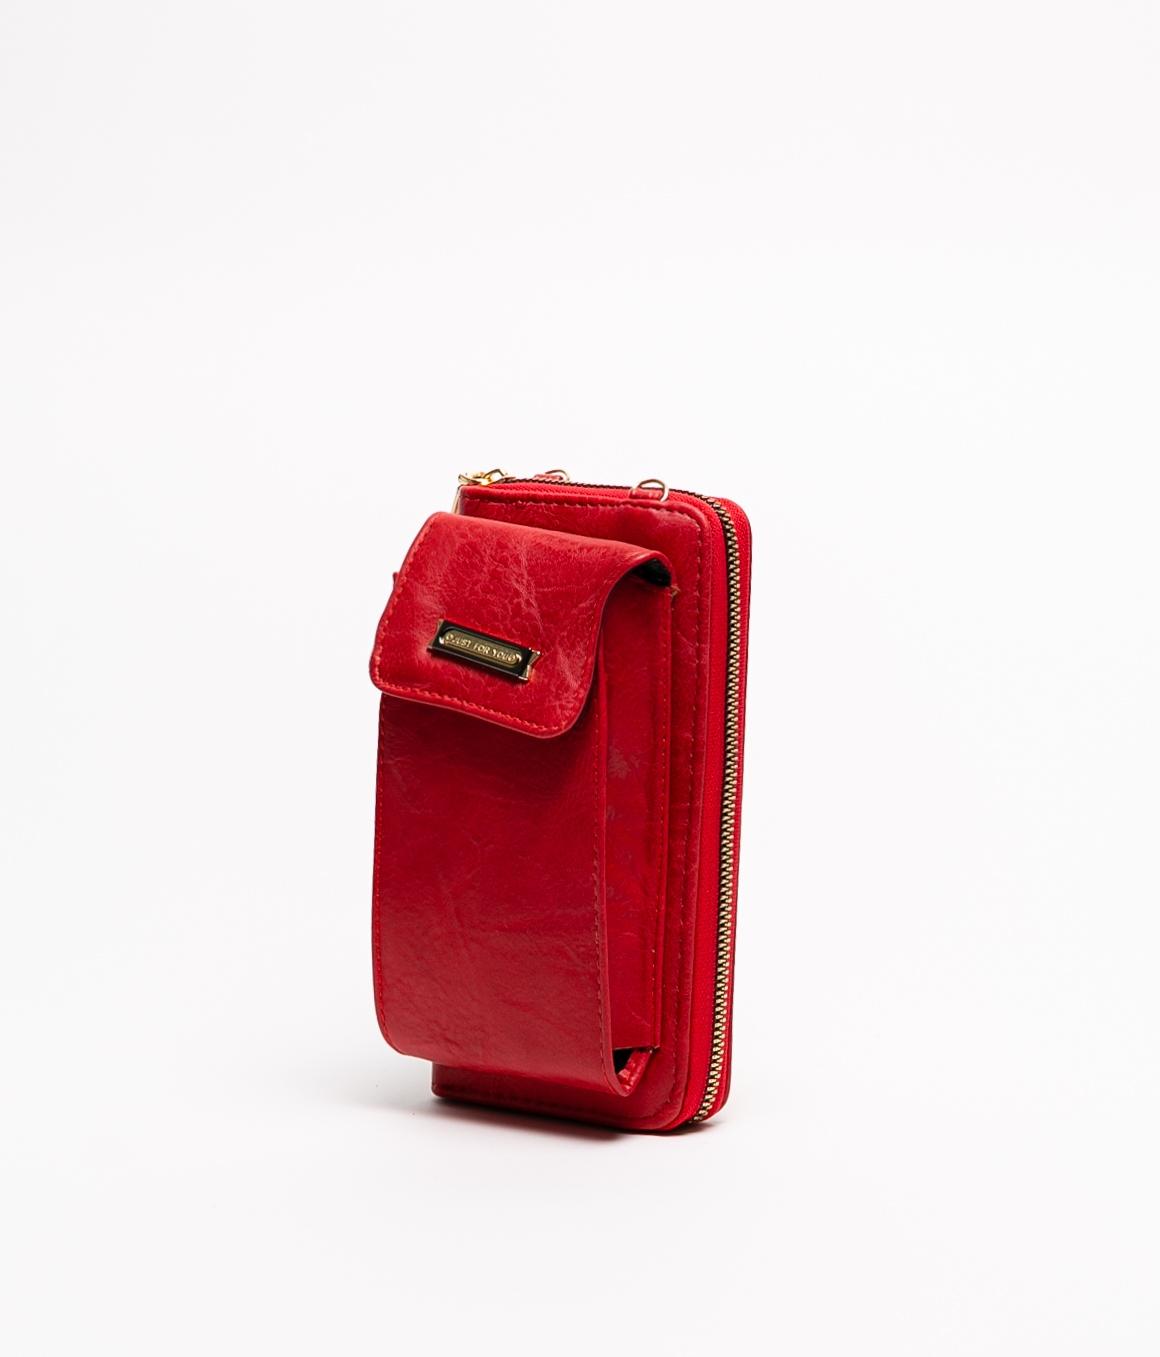 CORANE MOBILE HOLDER - RED